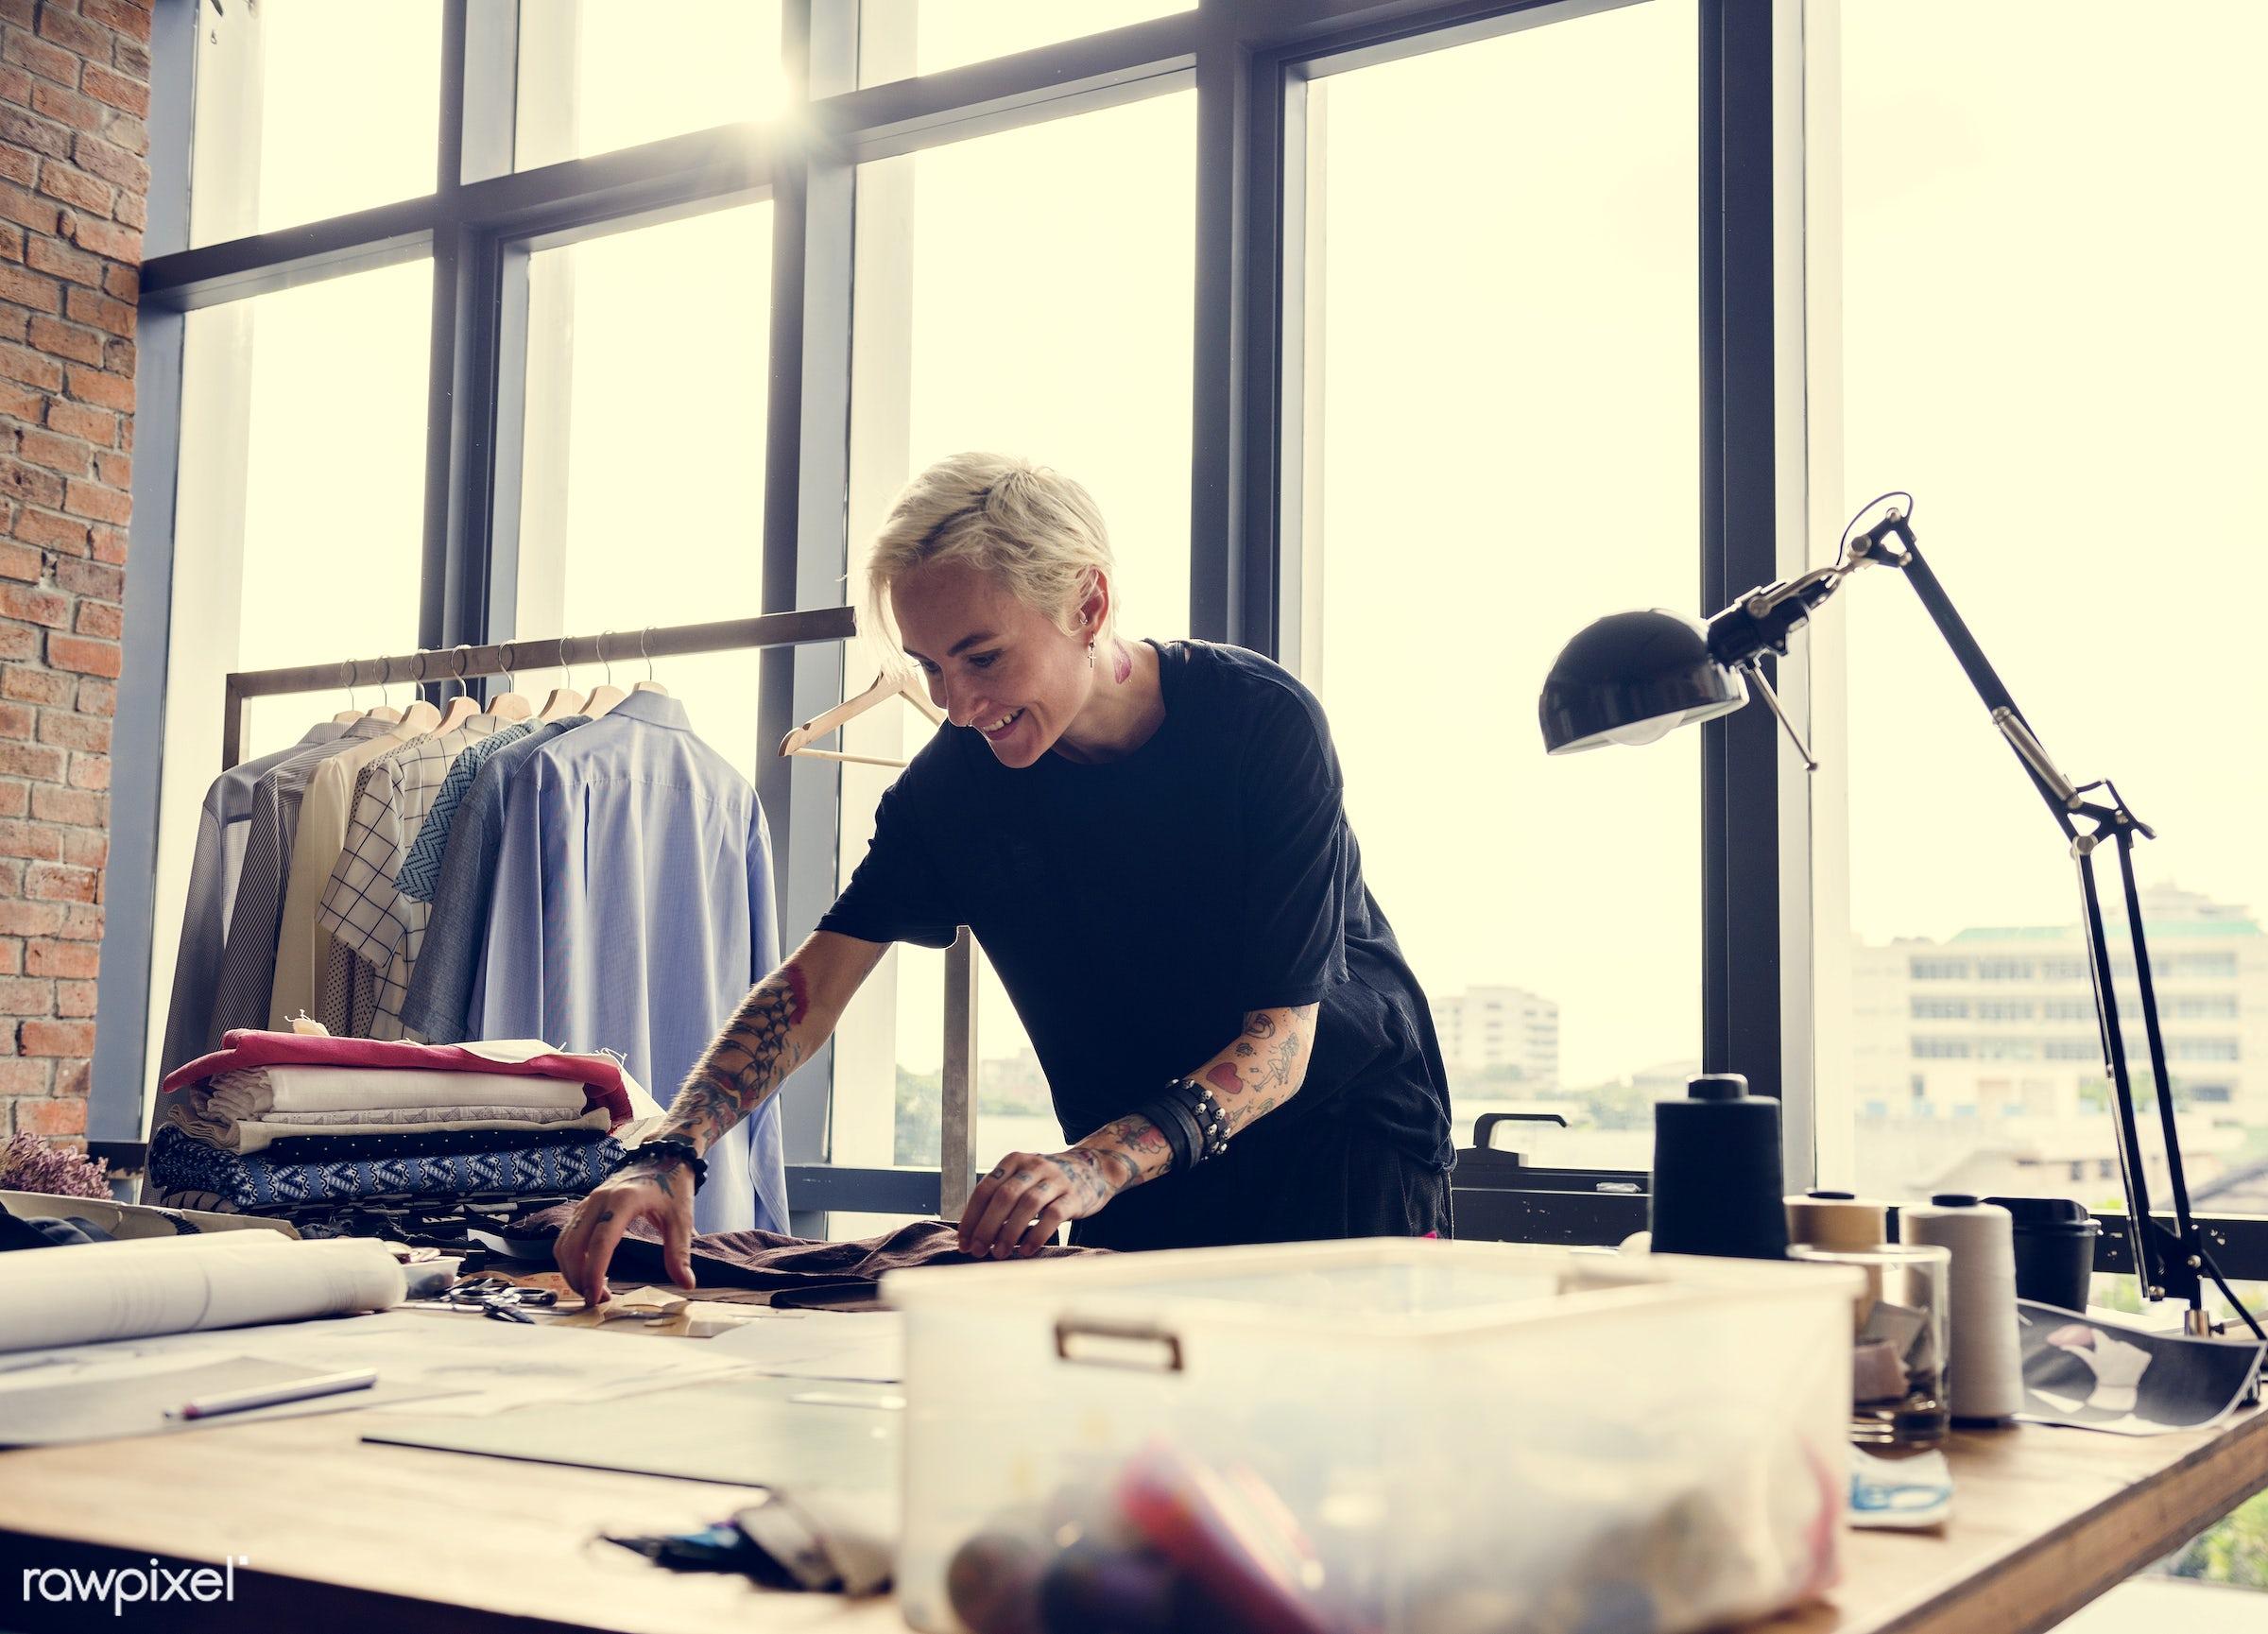 fashion, model, measure, clothing materials, clothing, designing, garment, dressmaker, indoors, trendy, selecting,...